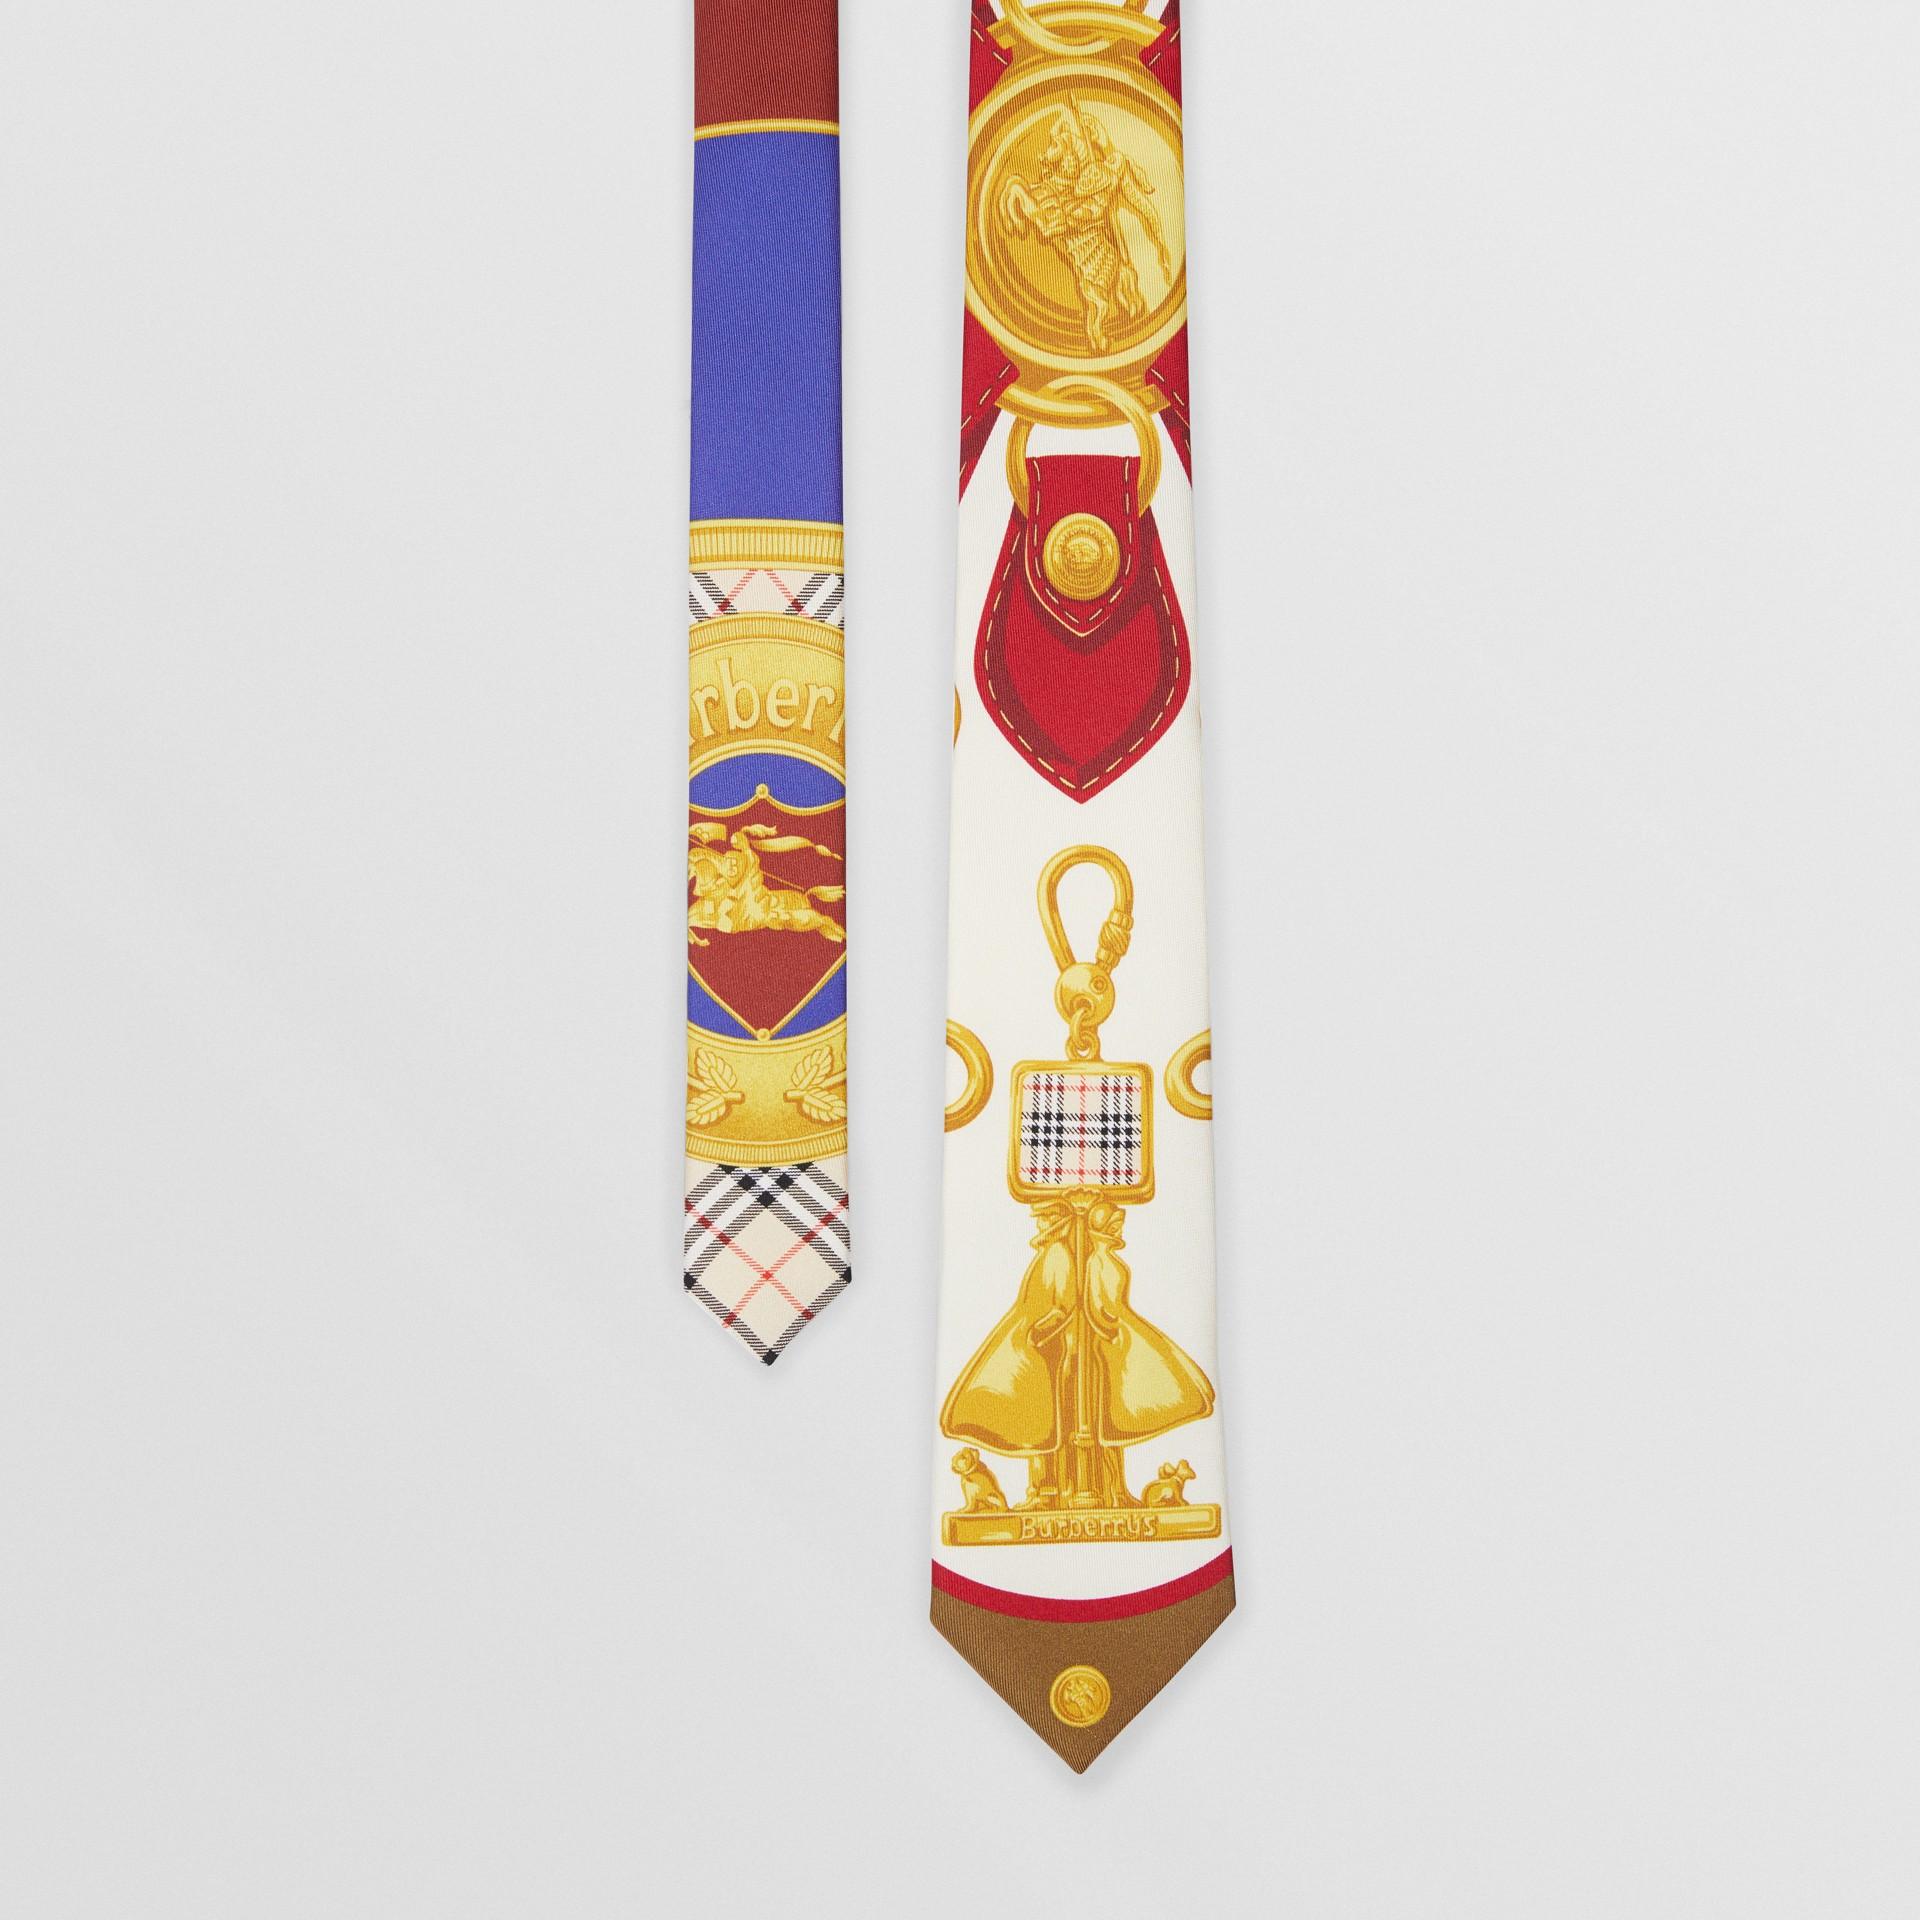 Modern Cut Archive Scarf Print Silk Tie in Burgundy - Men | Burberry - gallery image 0